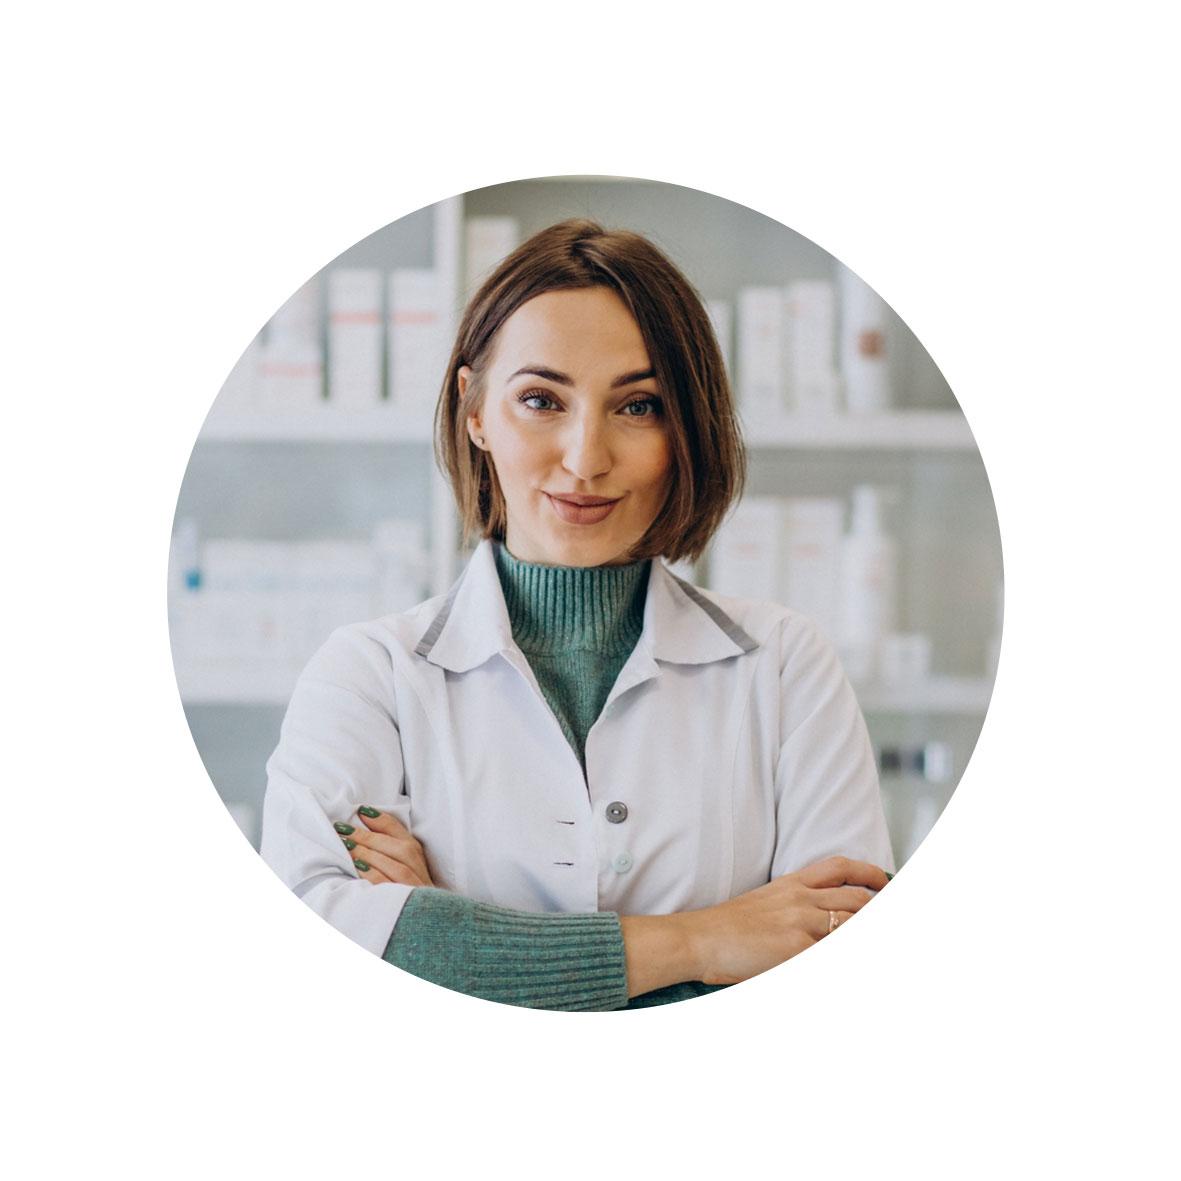 femme pharmacienne